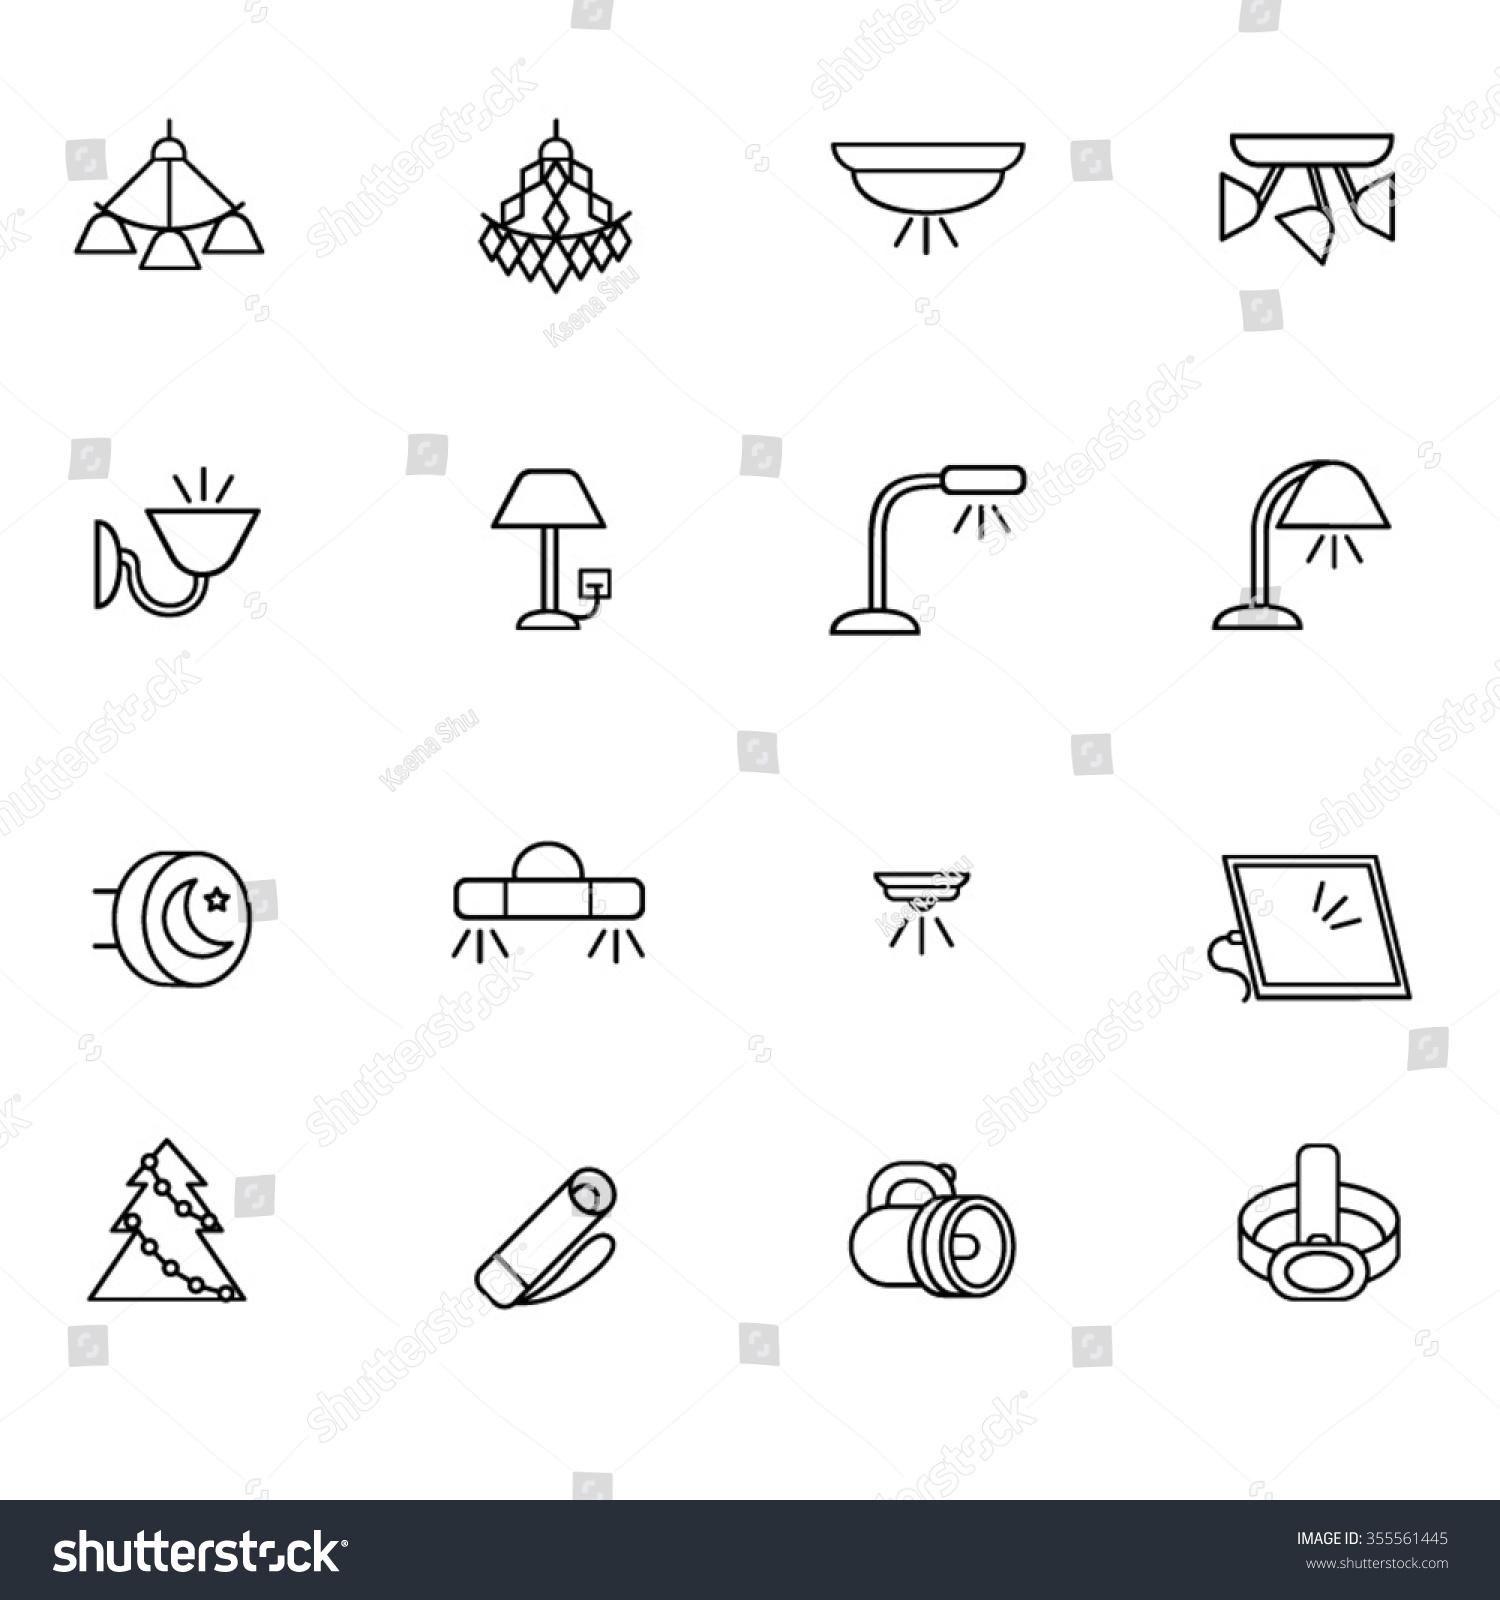 types lighting indoor use line icons stock vector 355561445 shutterstock. Black Bedroom Furniture Sets. Home Design Ideas